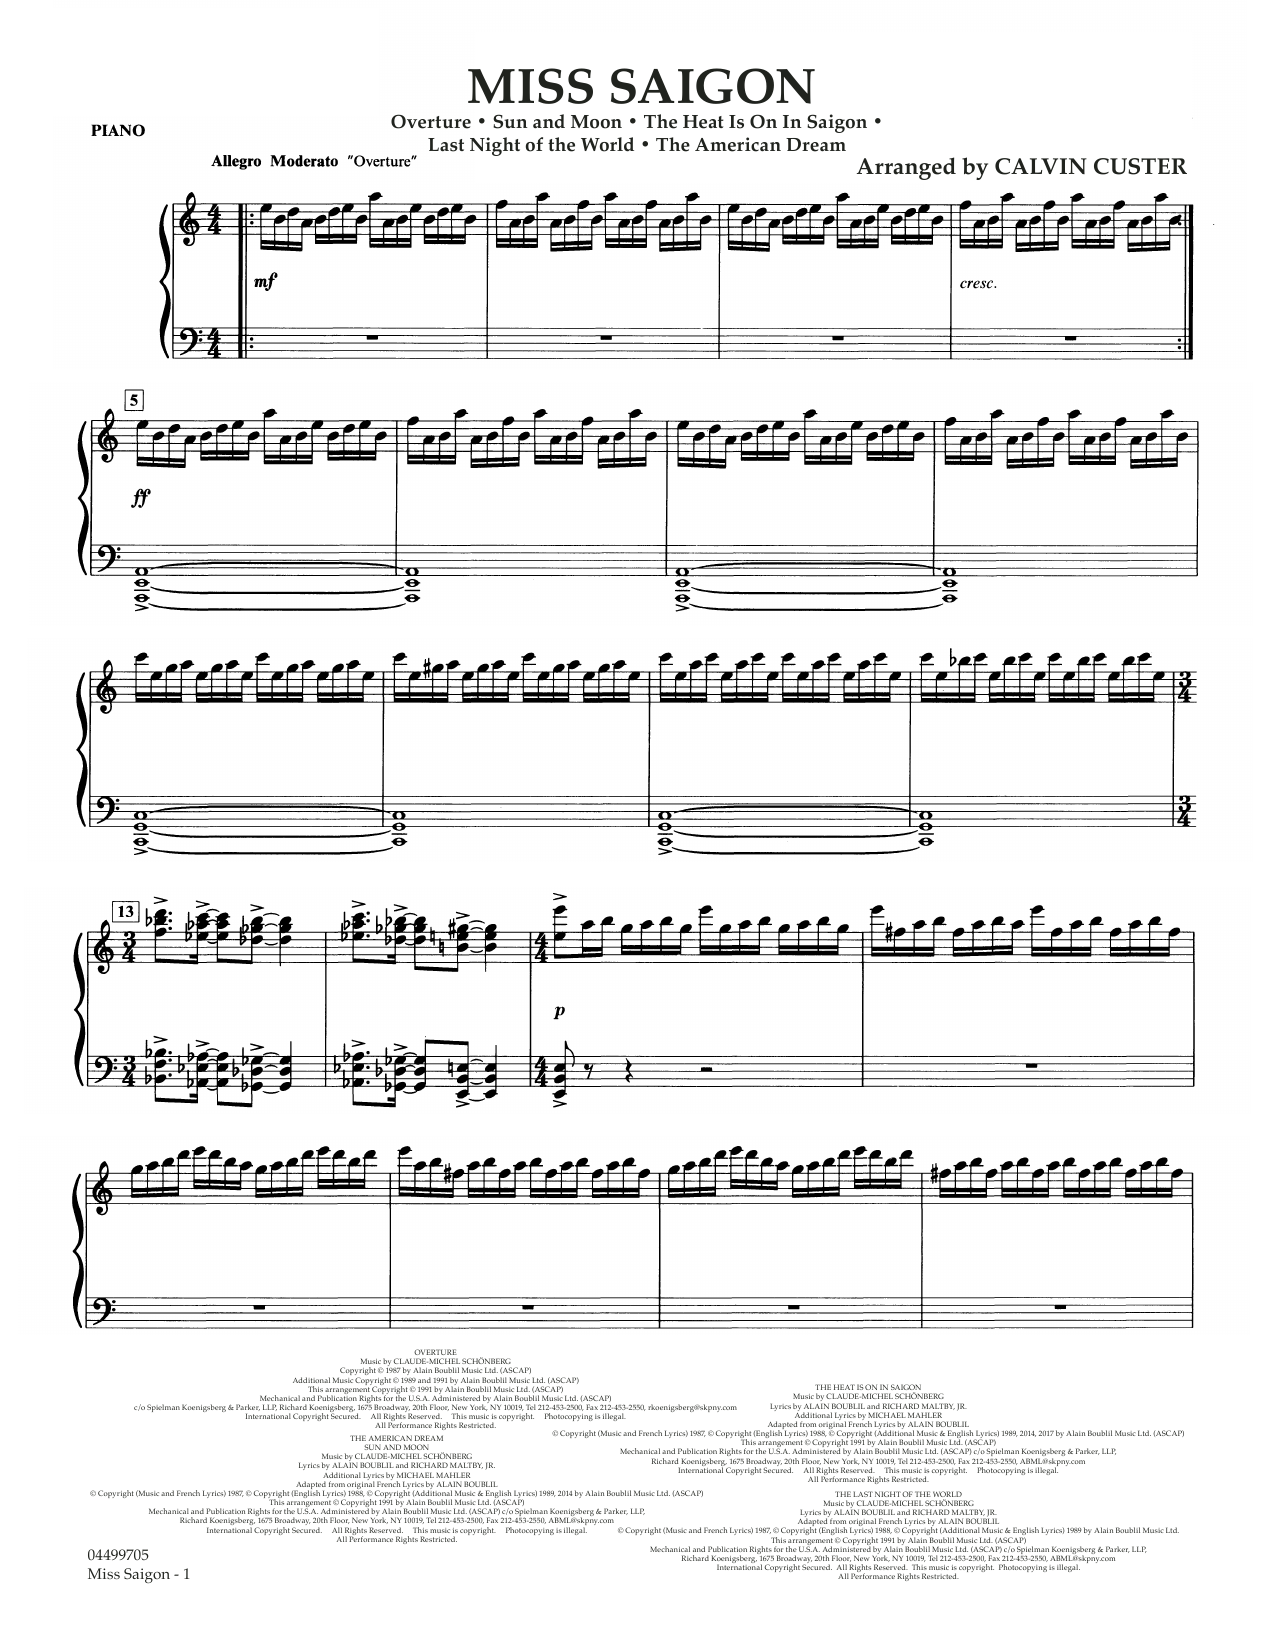 Miss Saigon (arr. Calvin Custer) - Piano (Full Orchestra)